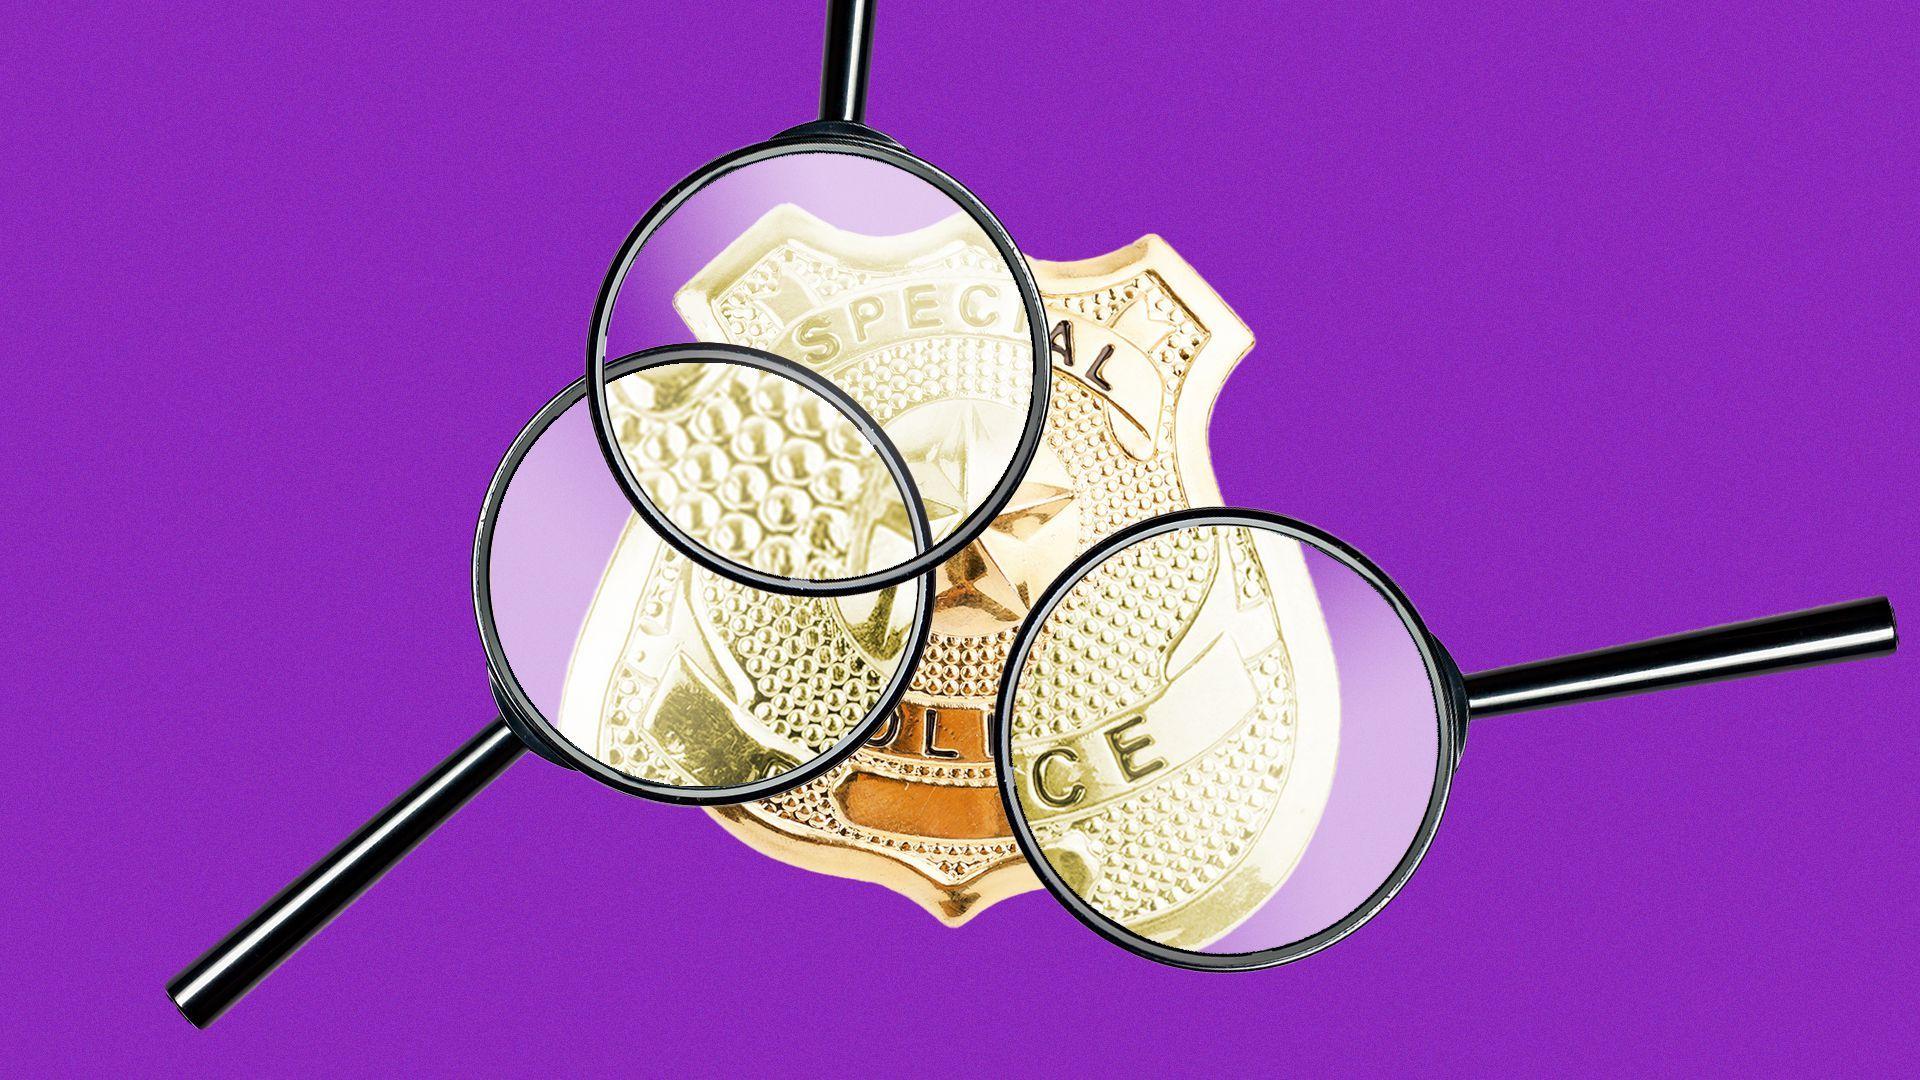 Illustration of many magnifying glasses examining a police badge